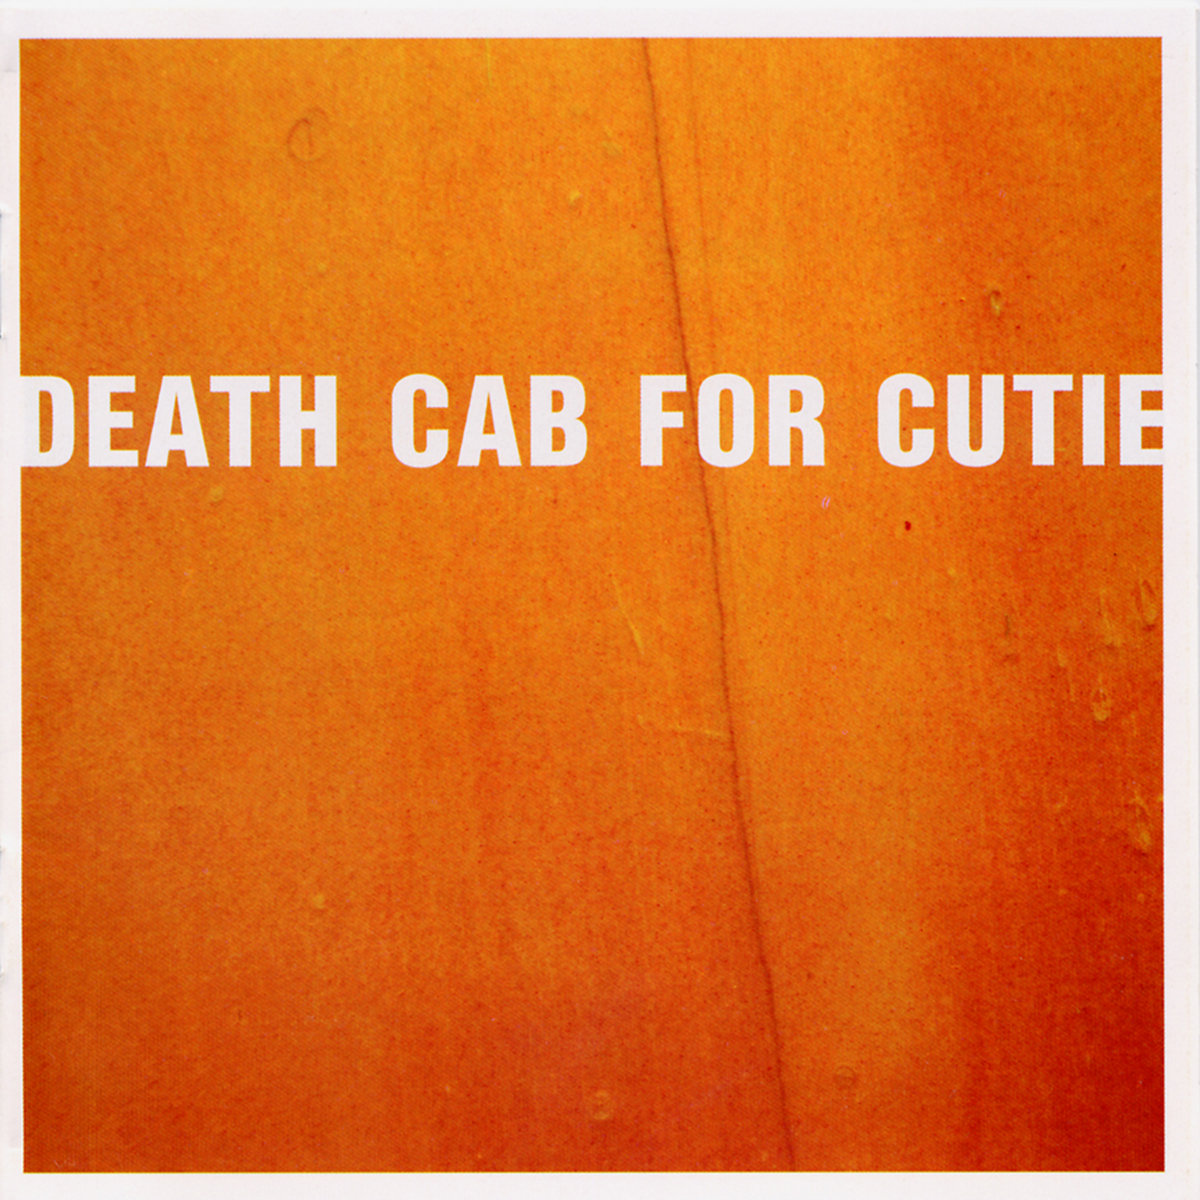 cab cutie death index mp3